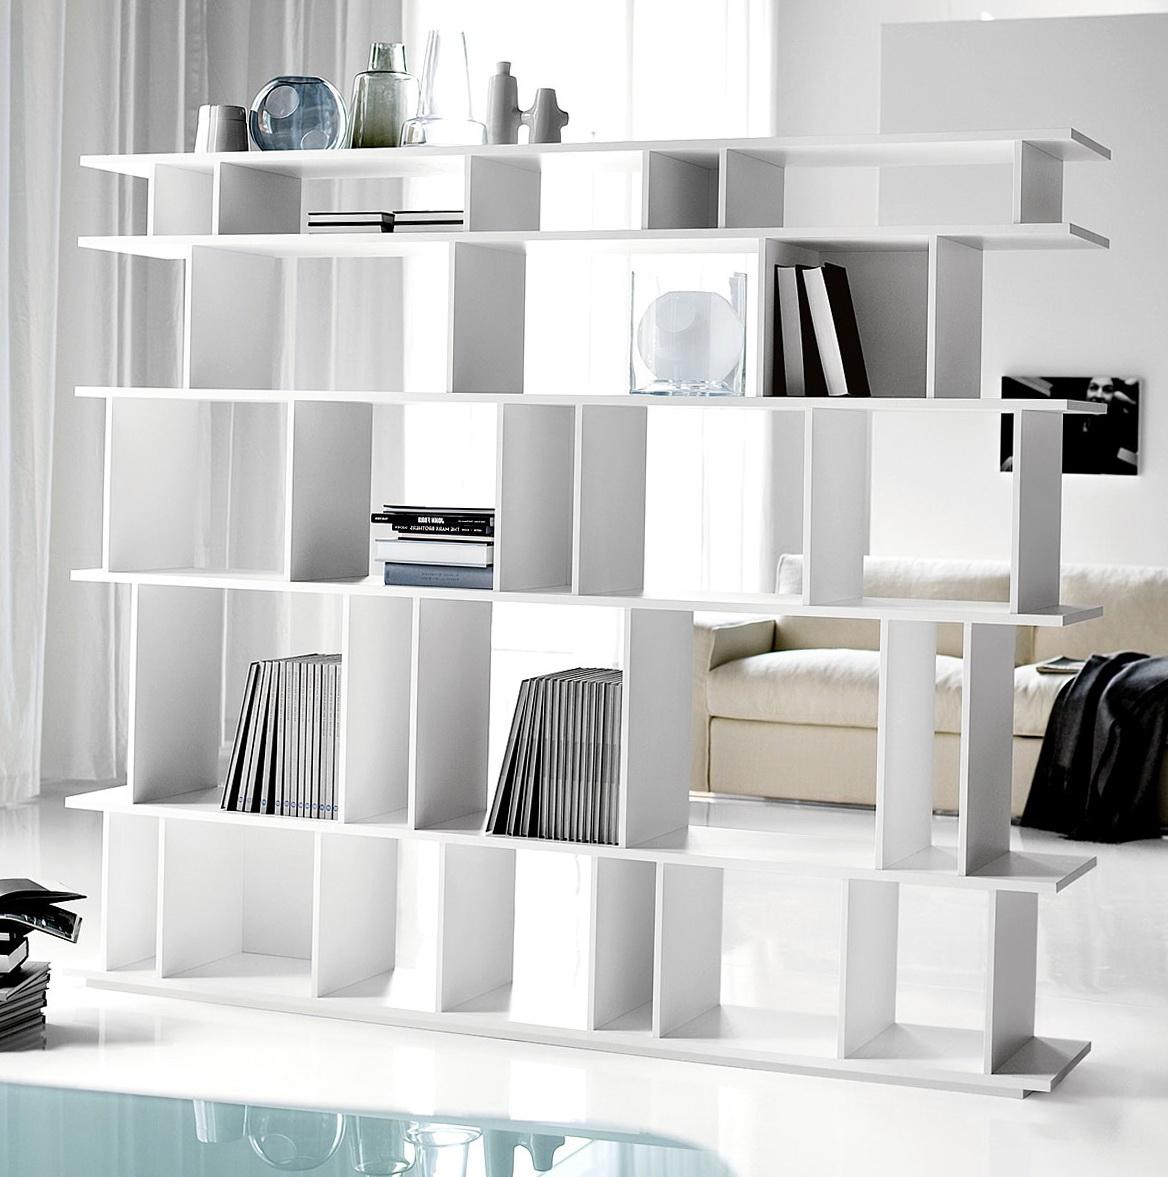 Permalink to Bookshelf Room Divider Diy